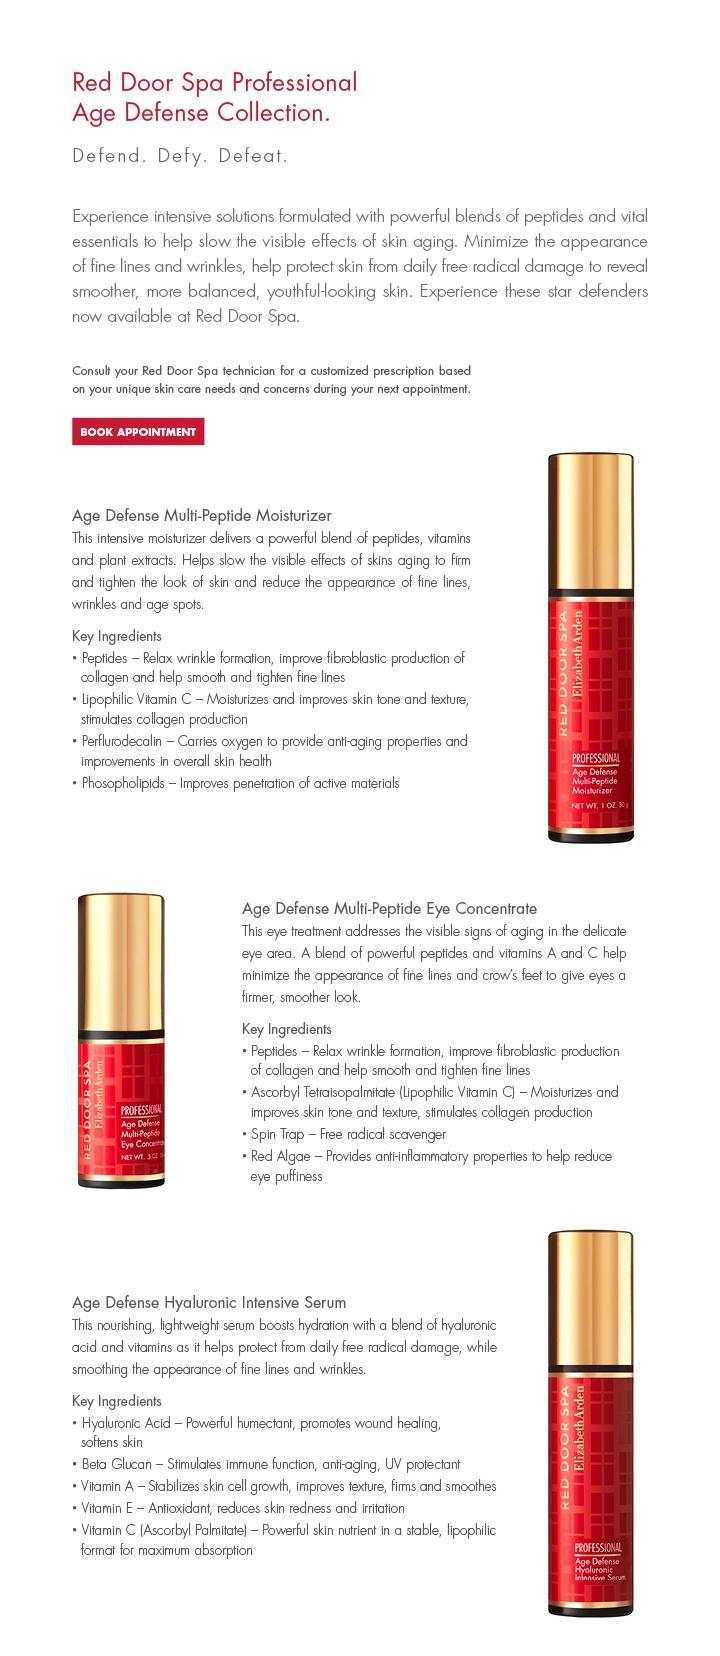 65 best red door revolution images on pinterest red doors red door spa professional star products vtopaller Images